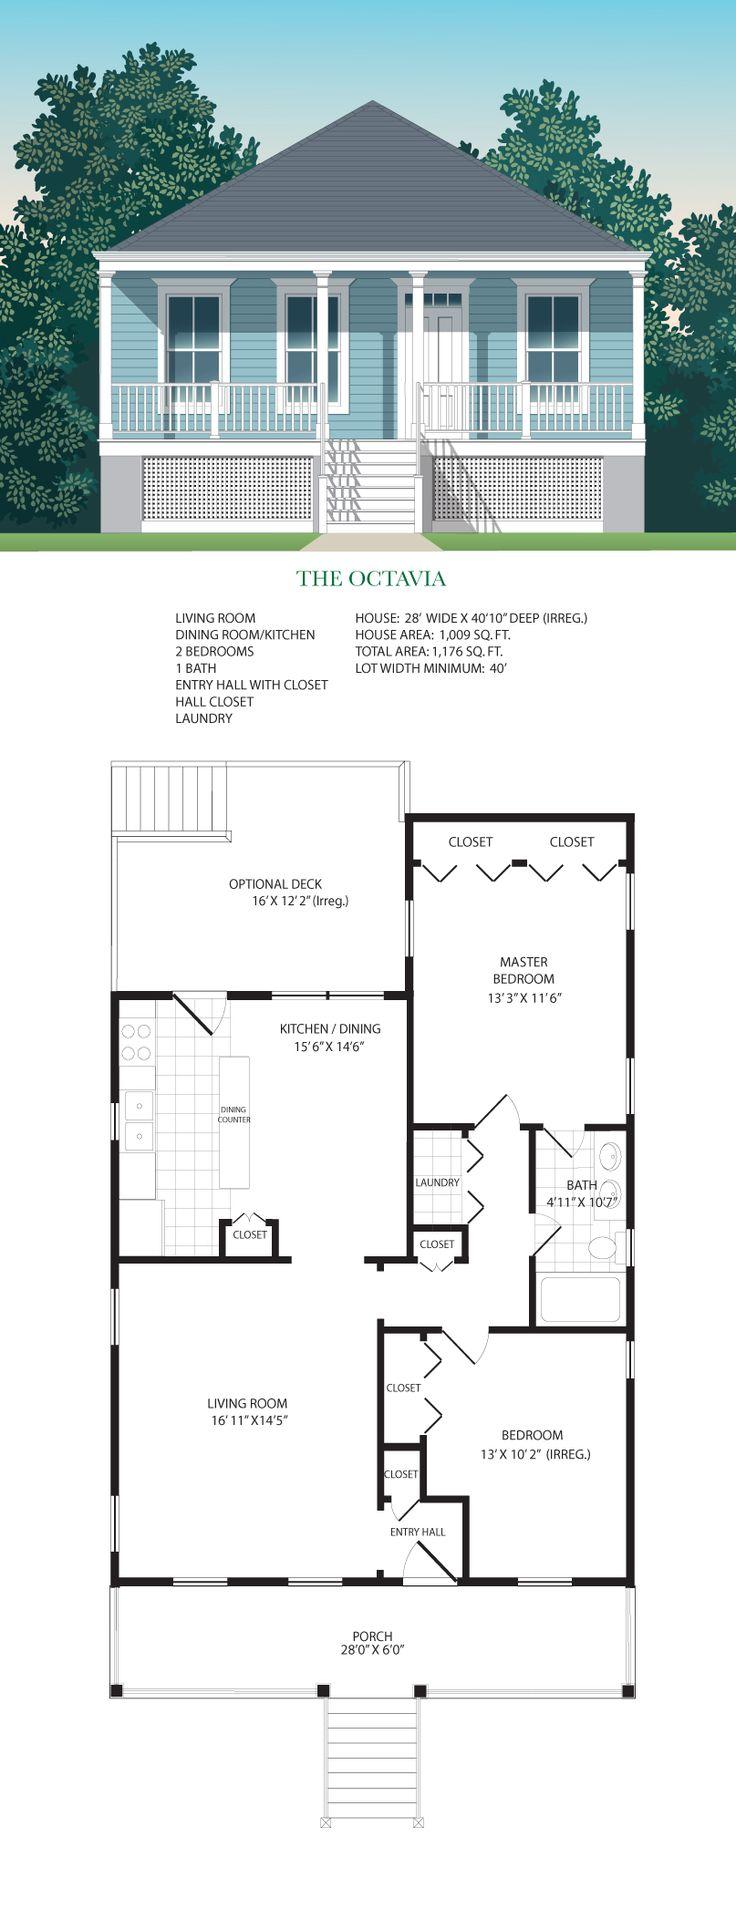 Shotgun house floor plan 28 images shotgun style house for Shotgun home floor plans